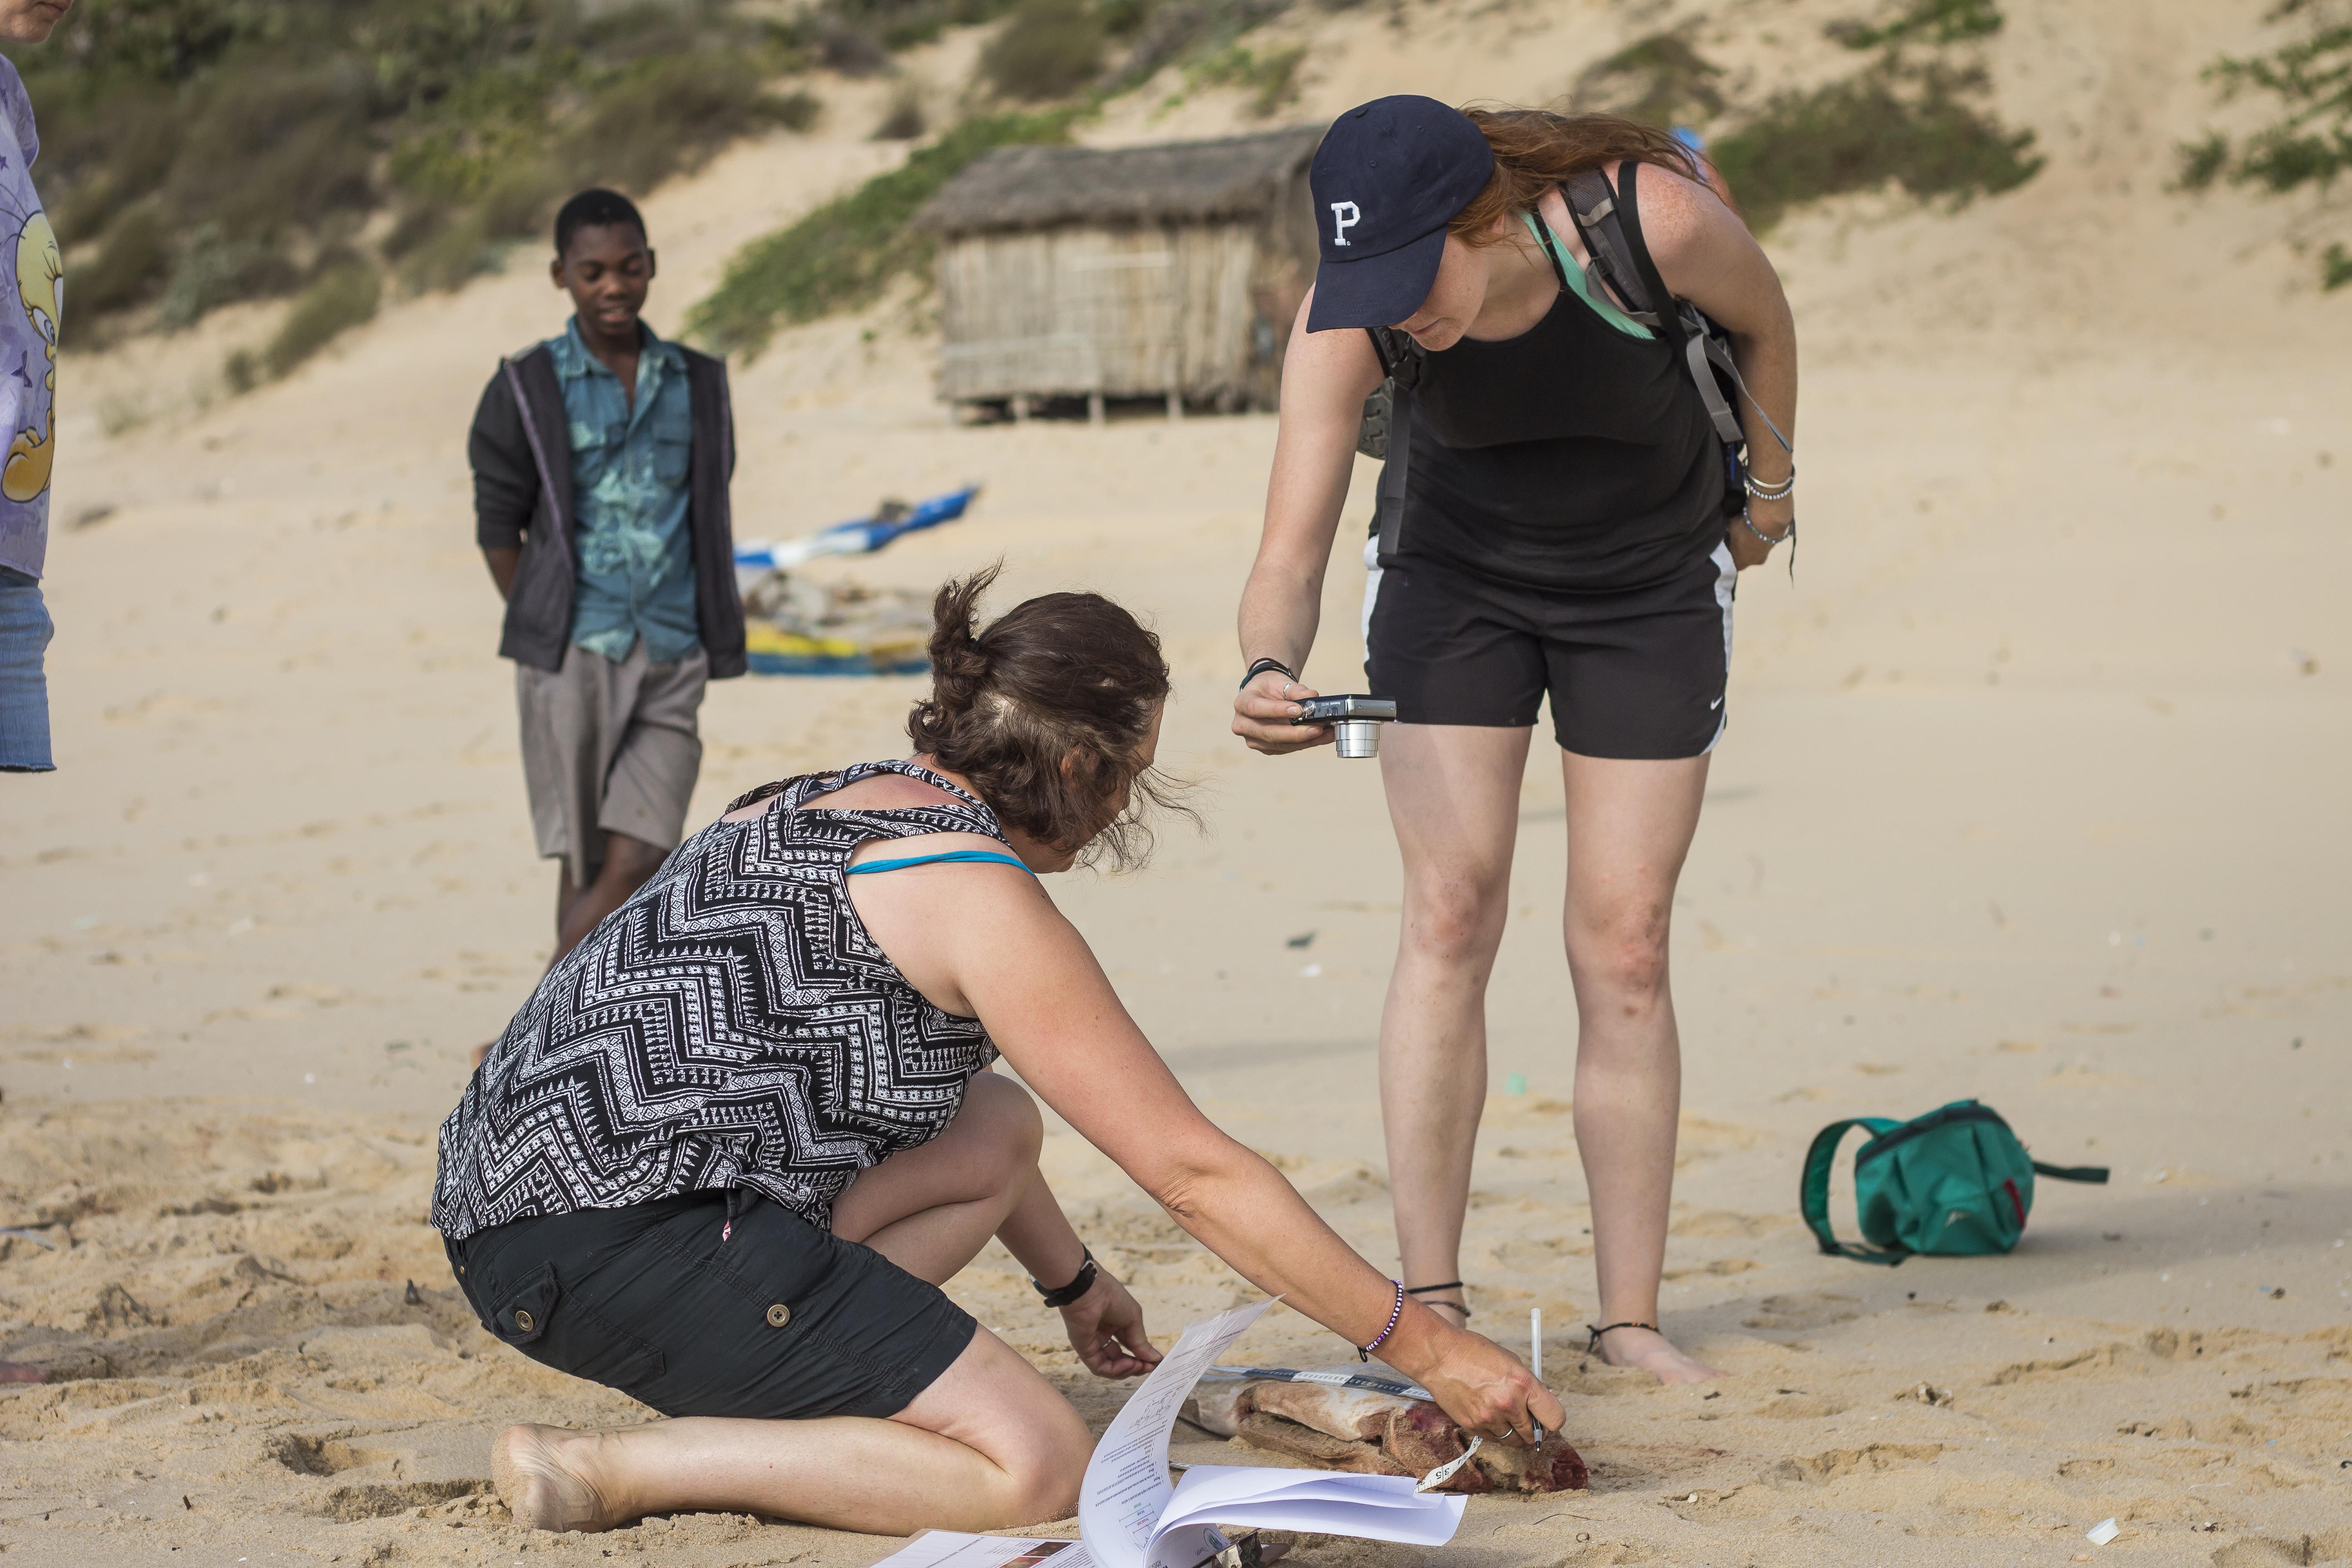 LTO_PWB_Fisheries research_Paindane_2016